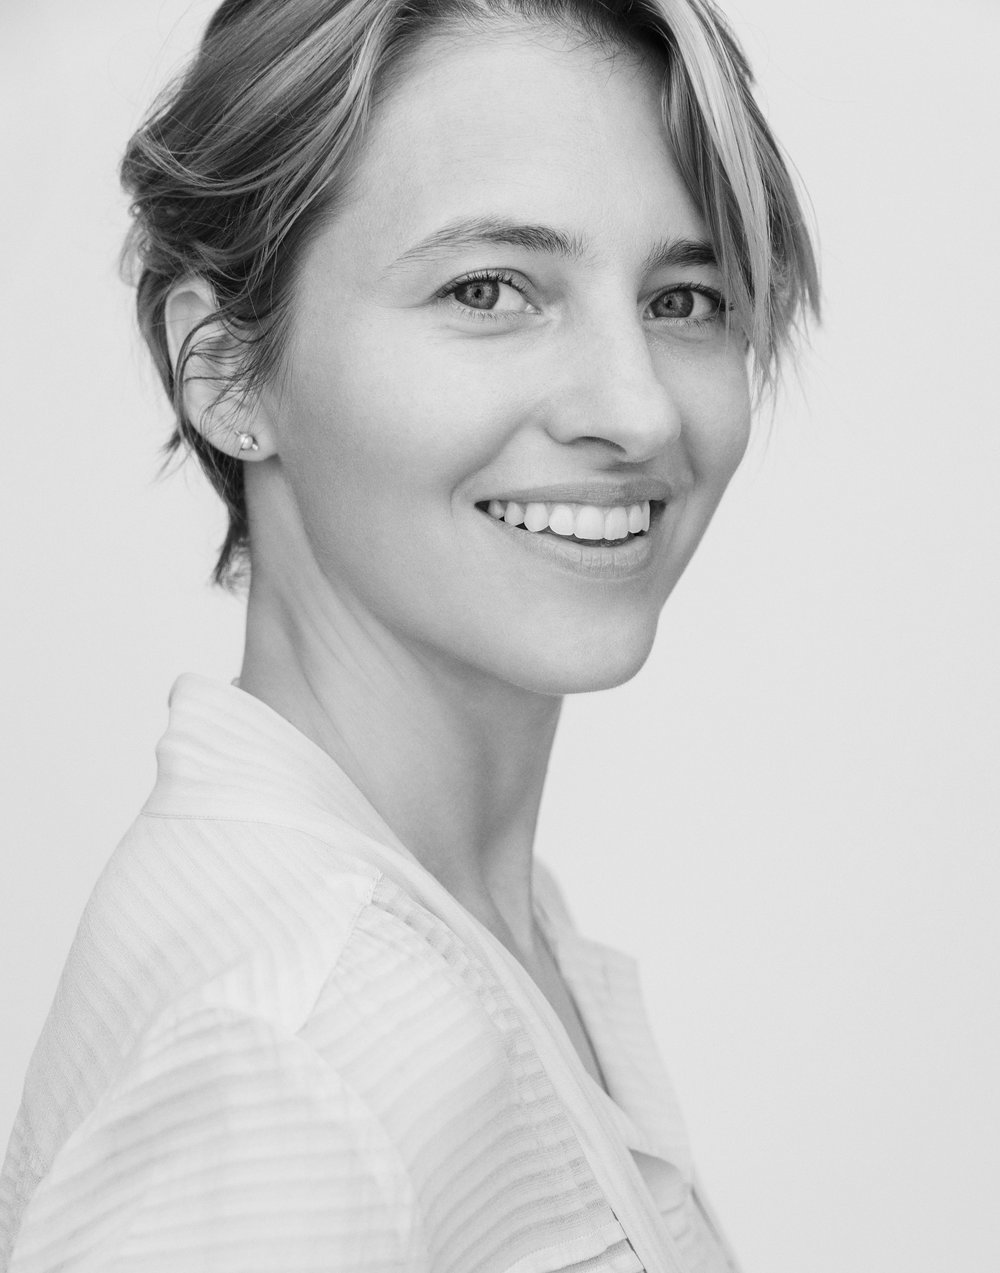 Sara Ziff. Photo by Kreg Holt.